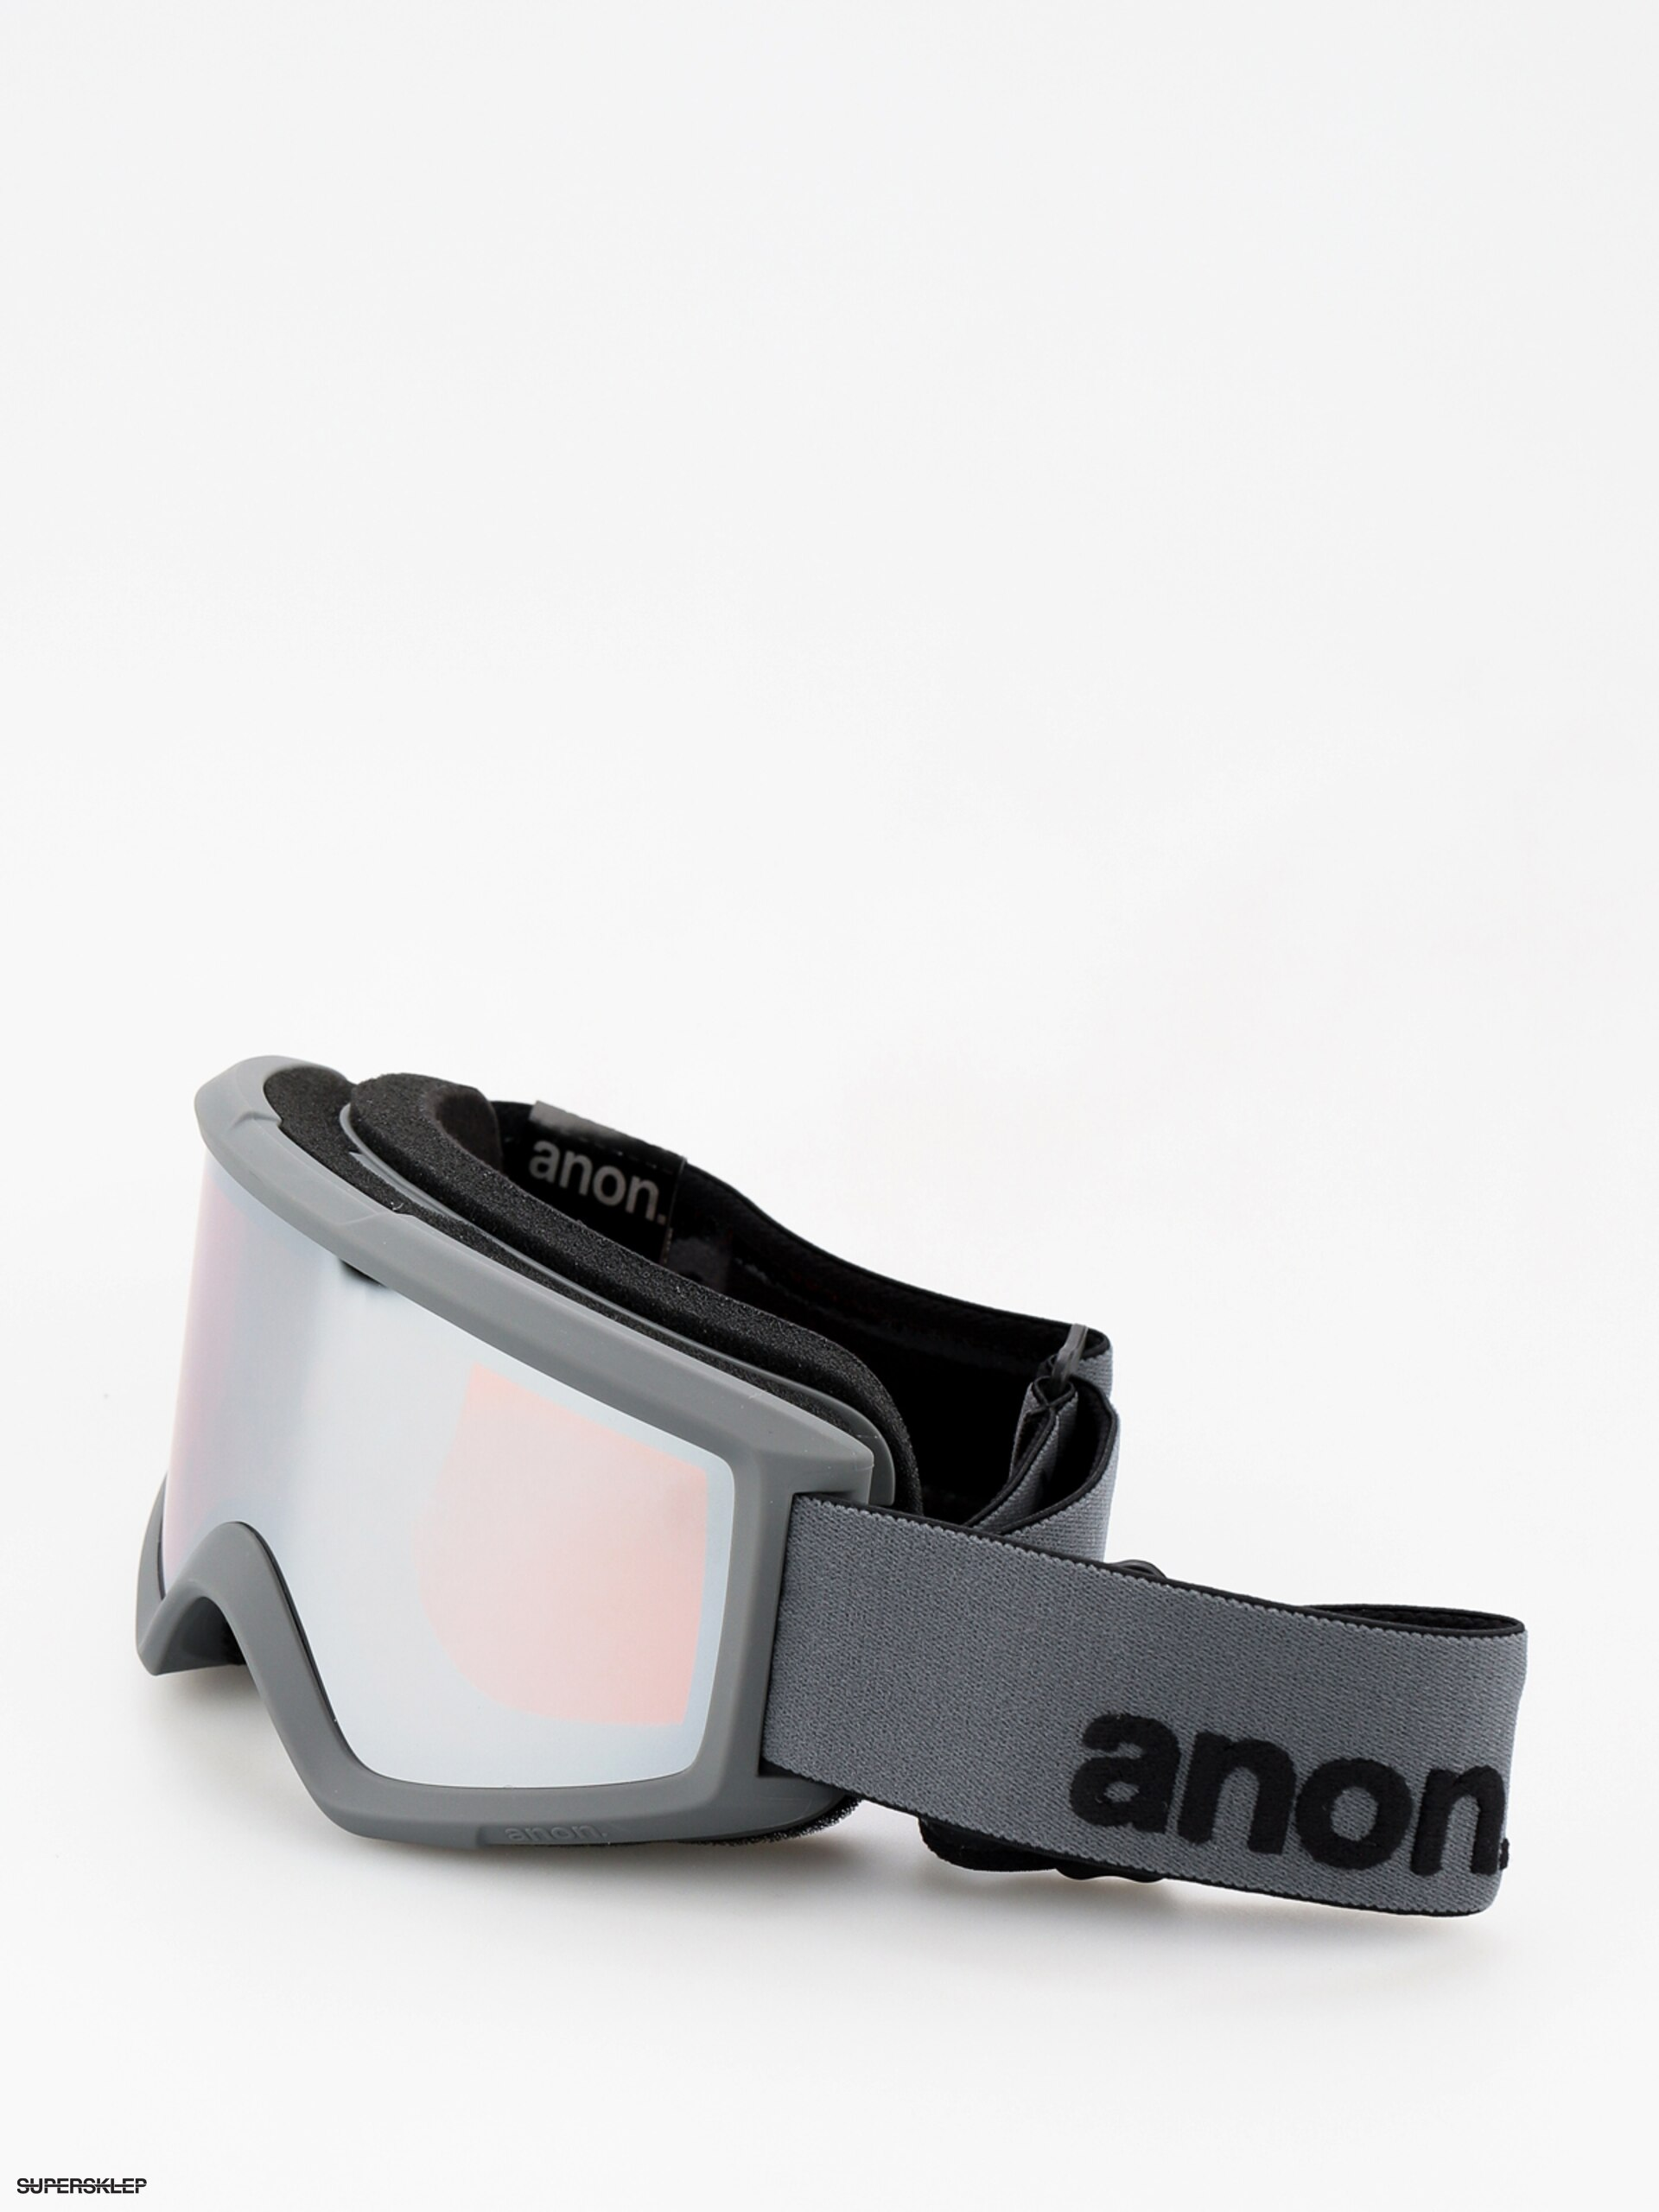 Okuliare na snowboard Anon Helix 2 Sonar W Spare (stealth sonar silver) 8126a468604